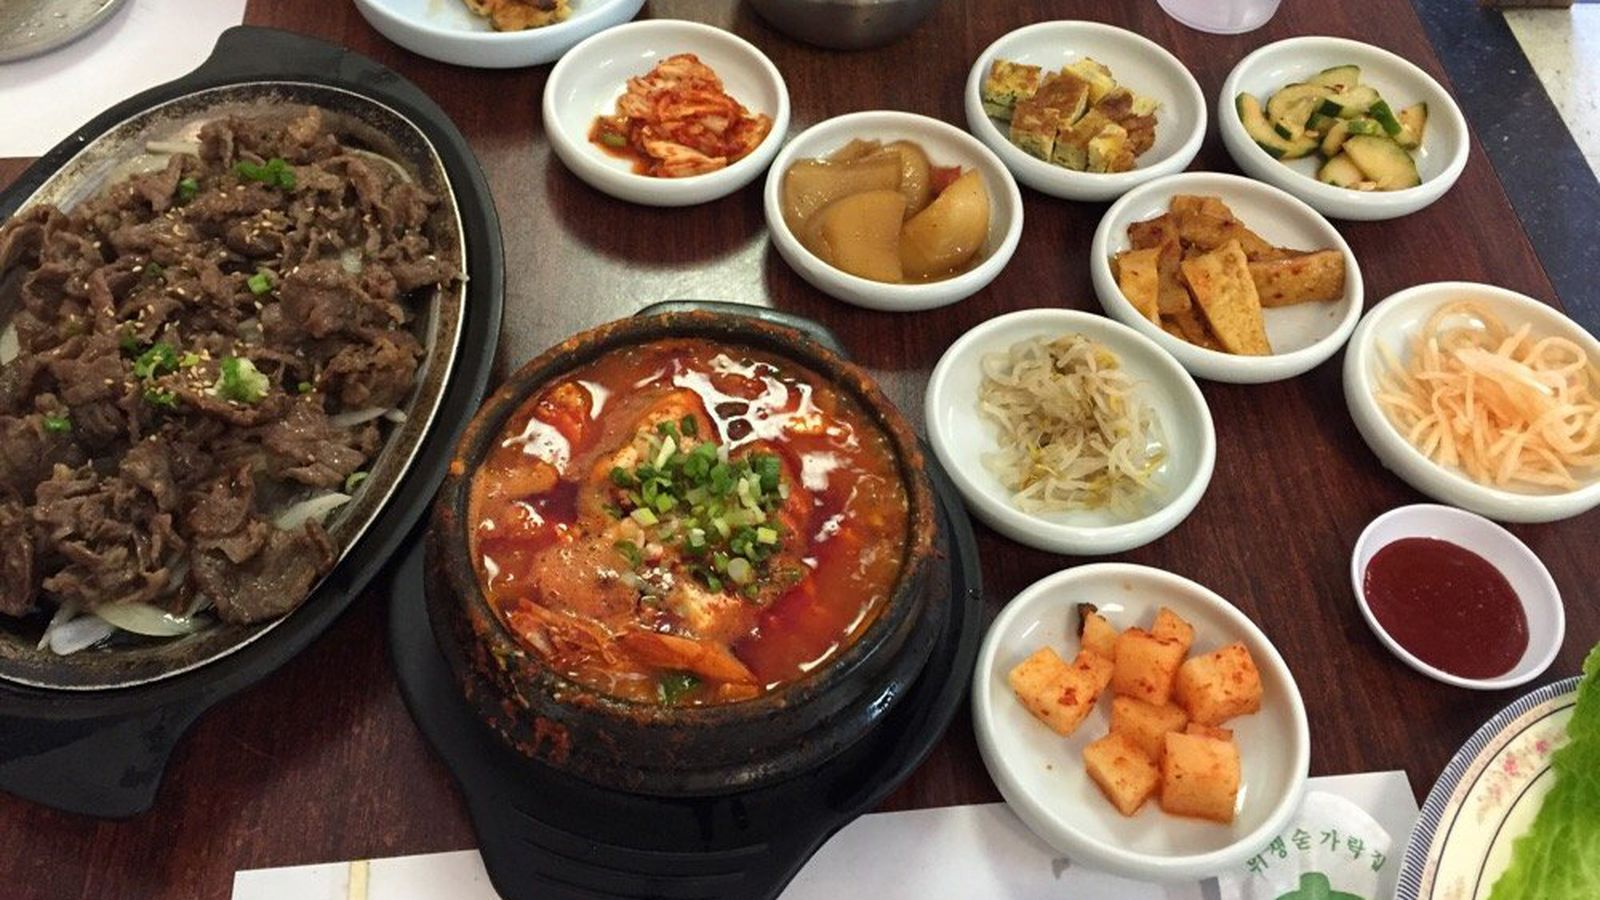 Five Top Notch Korean Restaurants To Try In Nashville